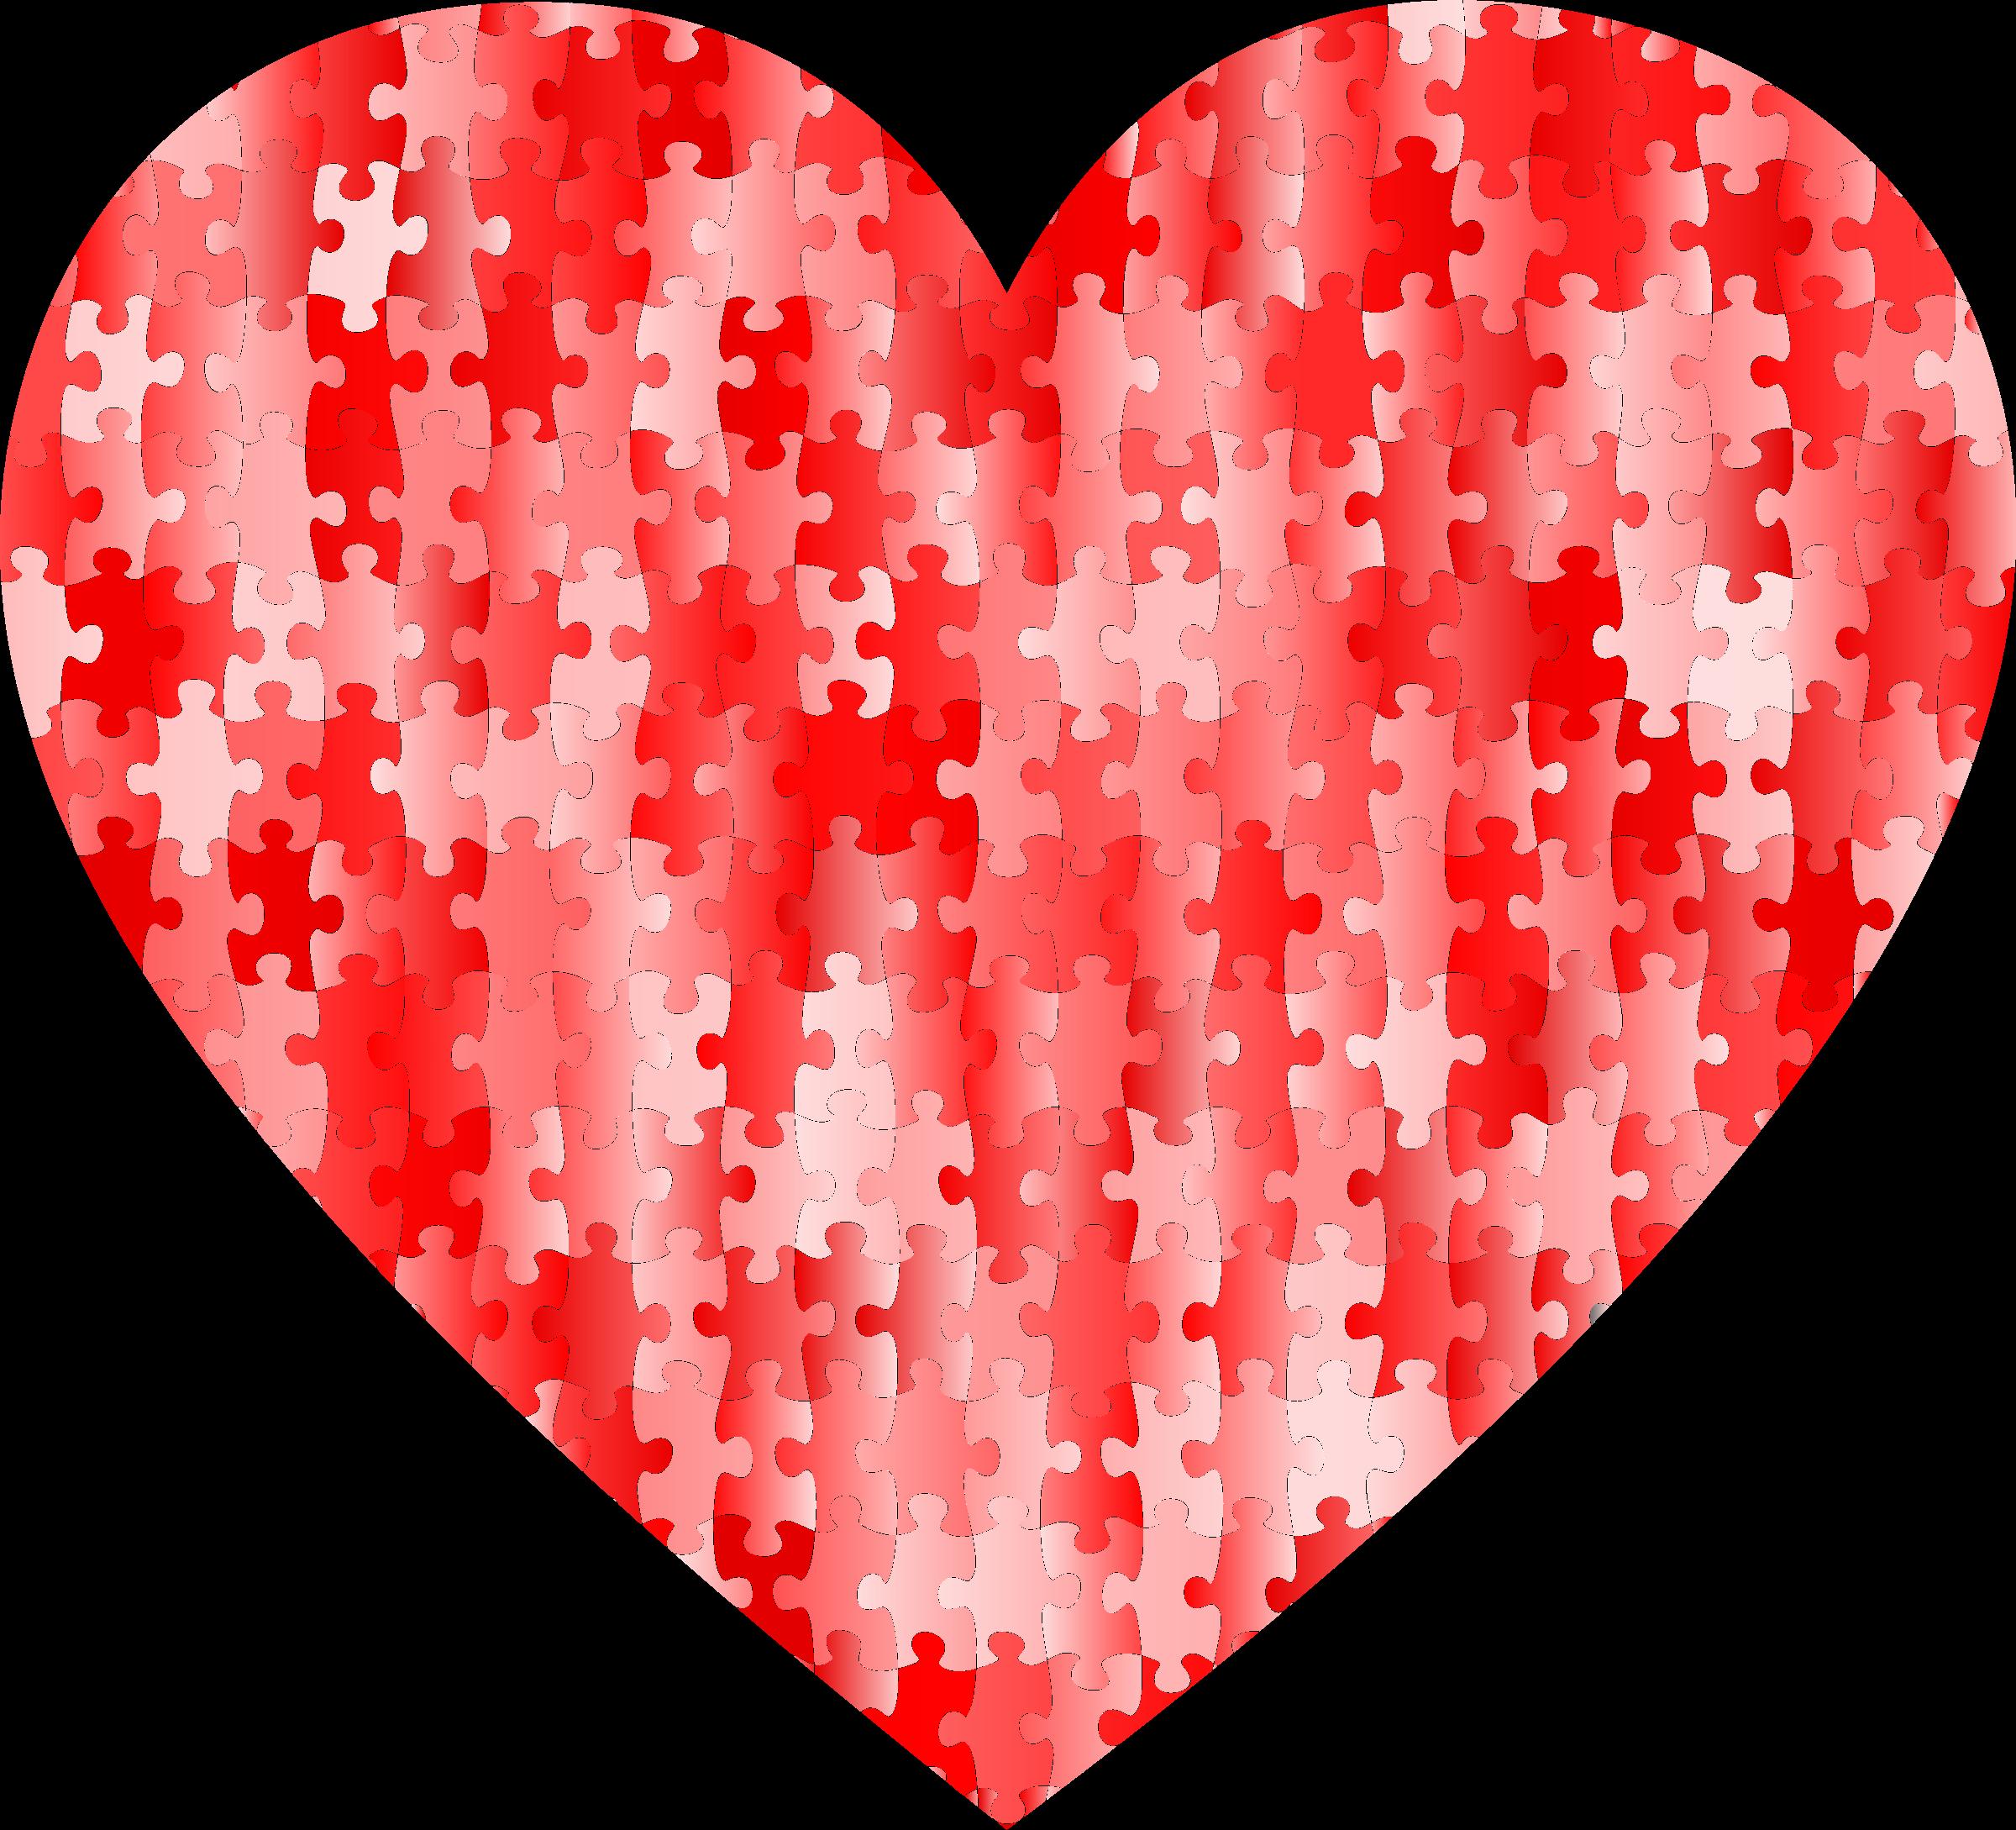 Puzzle heart clipart clip art freeuse download Red puzzle heart 3 Icons PNG - Free PNG and Icons Downloads clip art freeuse download